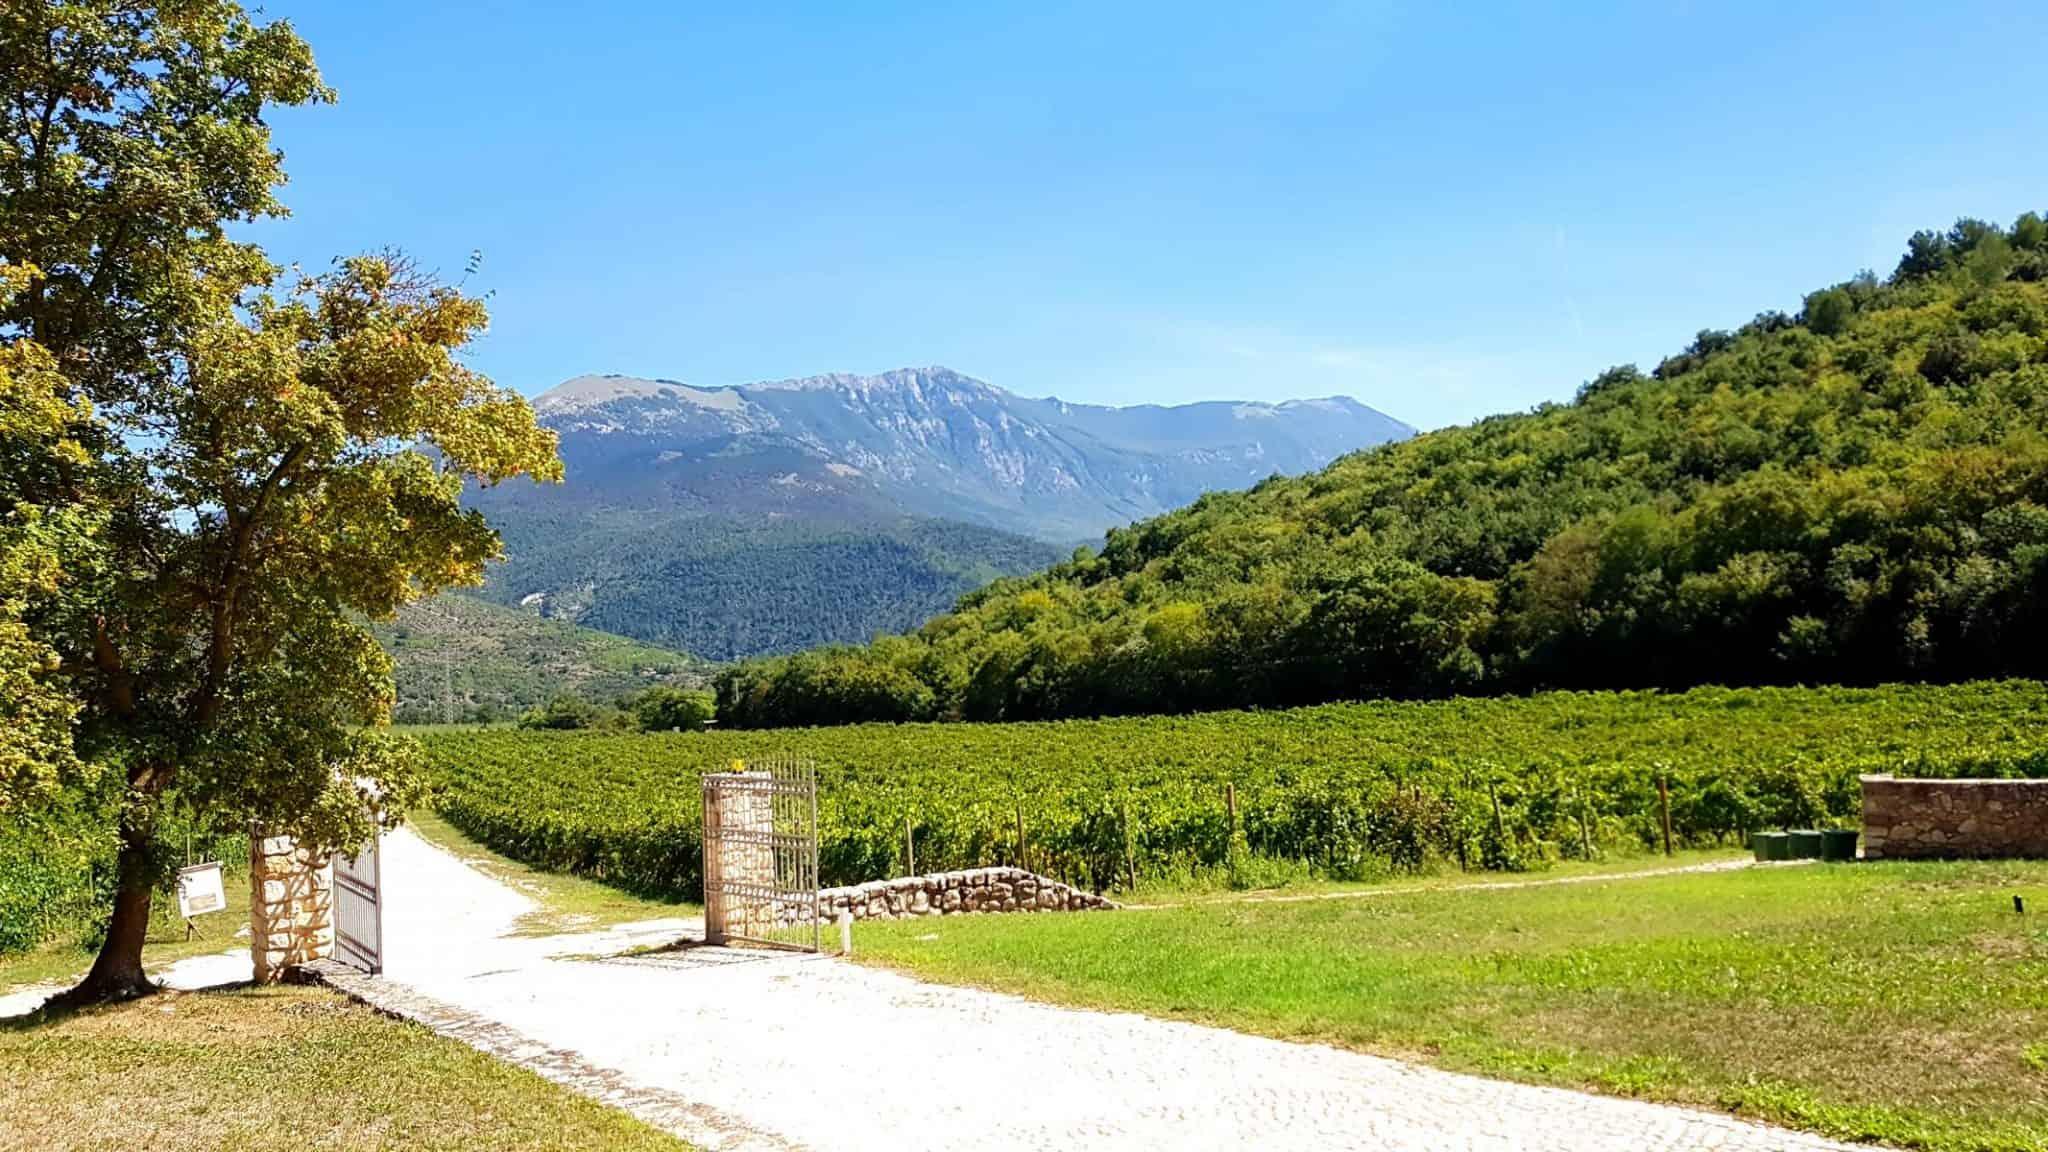 weinblog-weltreise-landschaft-italien-berge